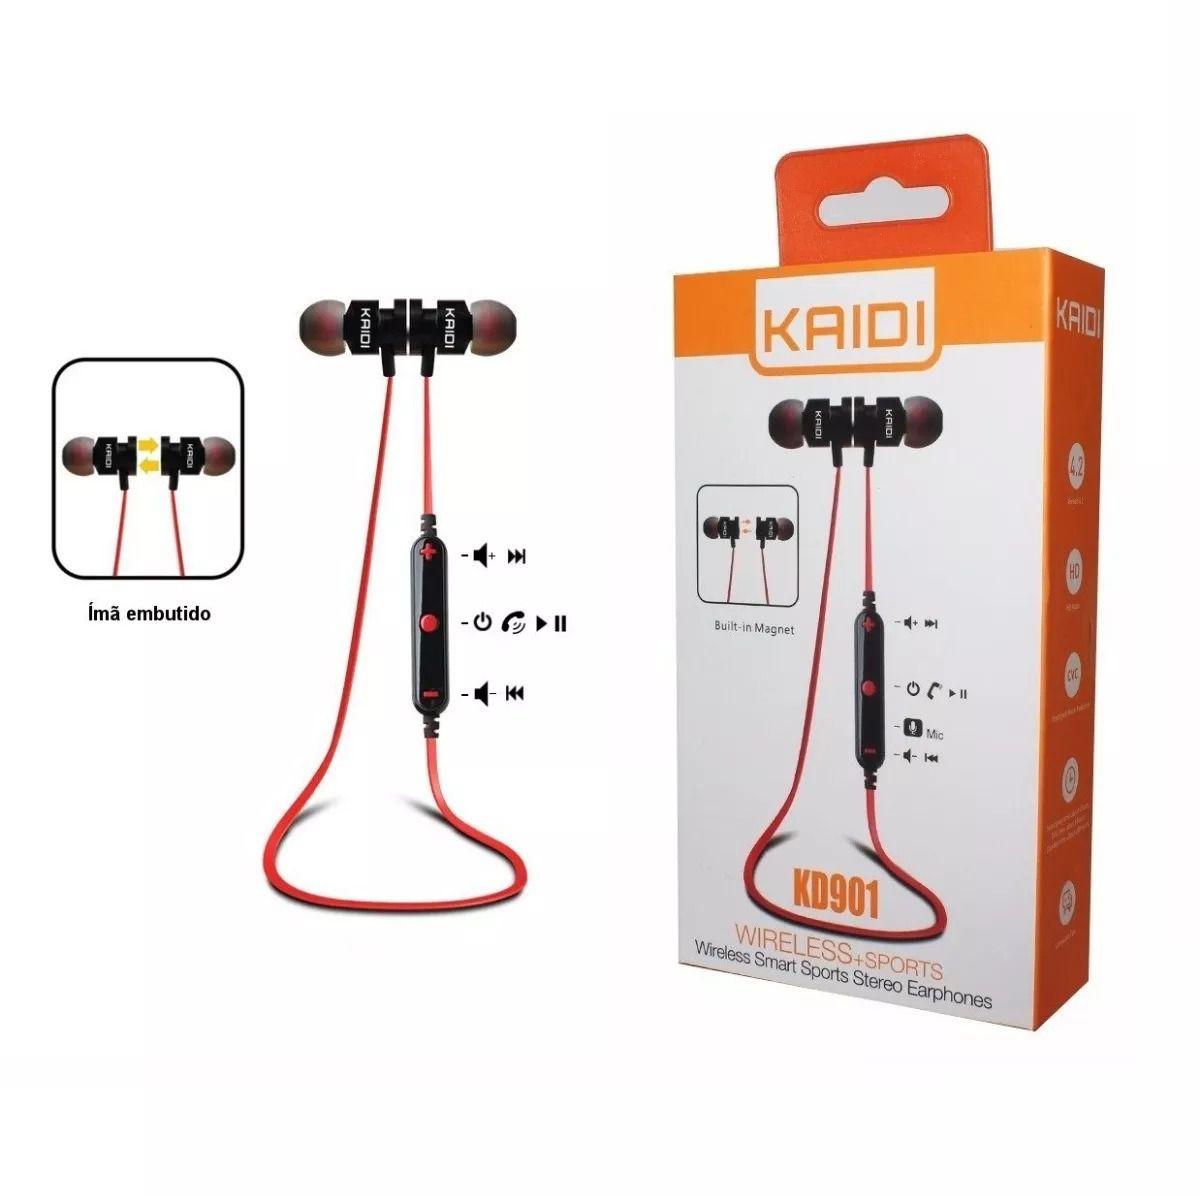 Fone de Ouvido Bluetooth Intra-Auricular Magnético Kaidi KD901